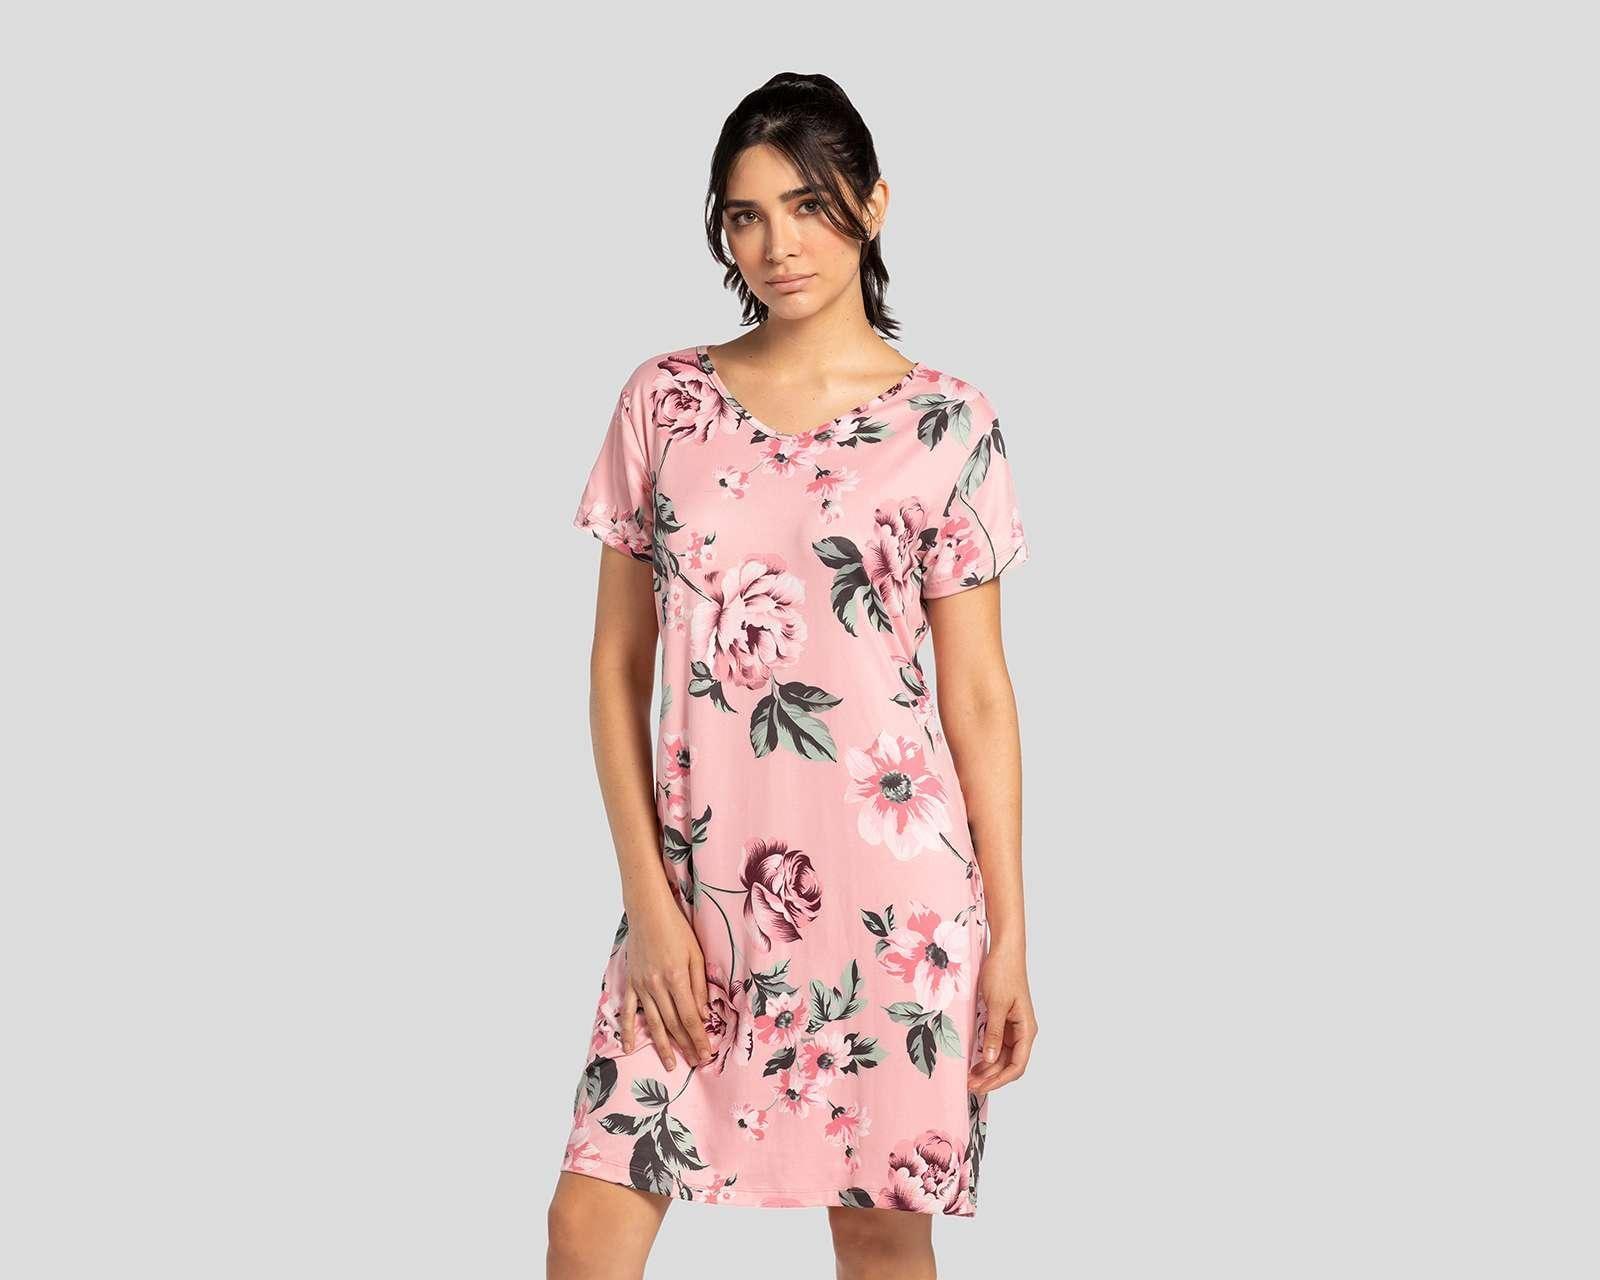 Camisón color Rosa marca Beauty Secret para Mujer